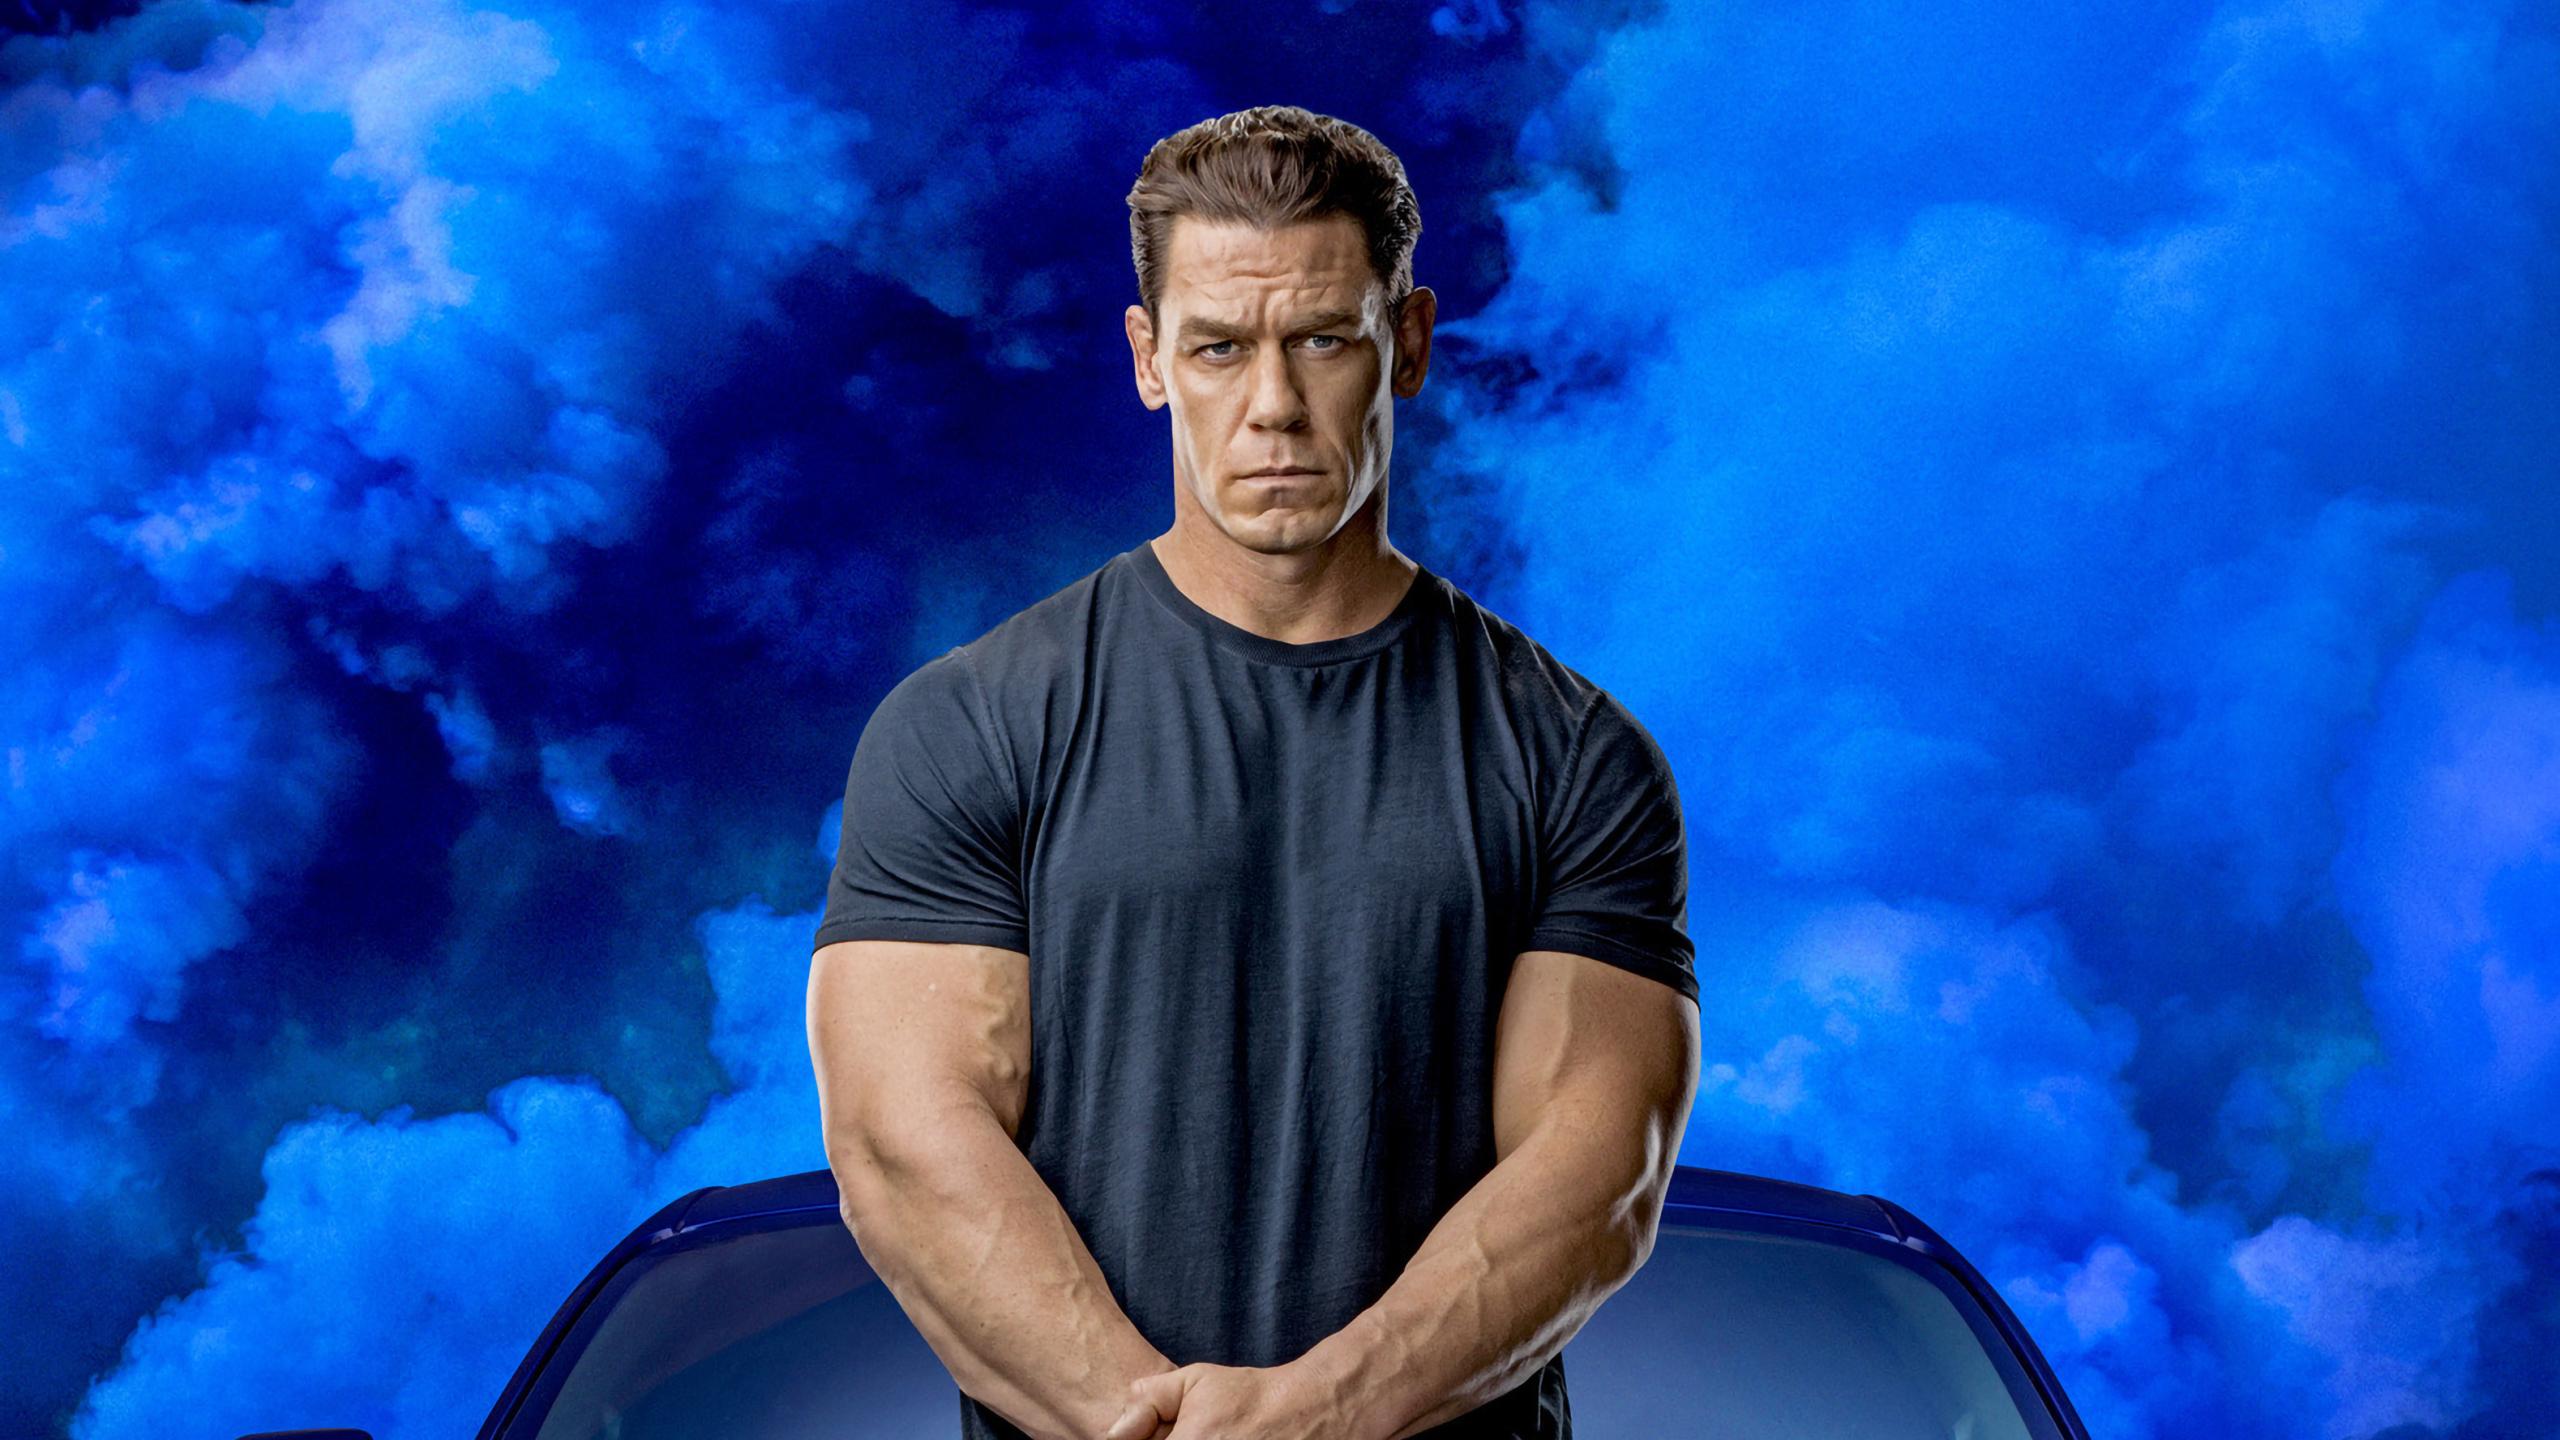 2560x1440 John Cena Fast And Furious 9 1440P Resolution ...